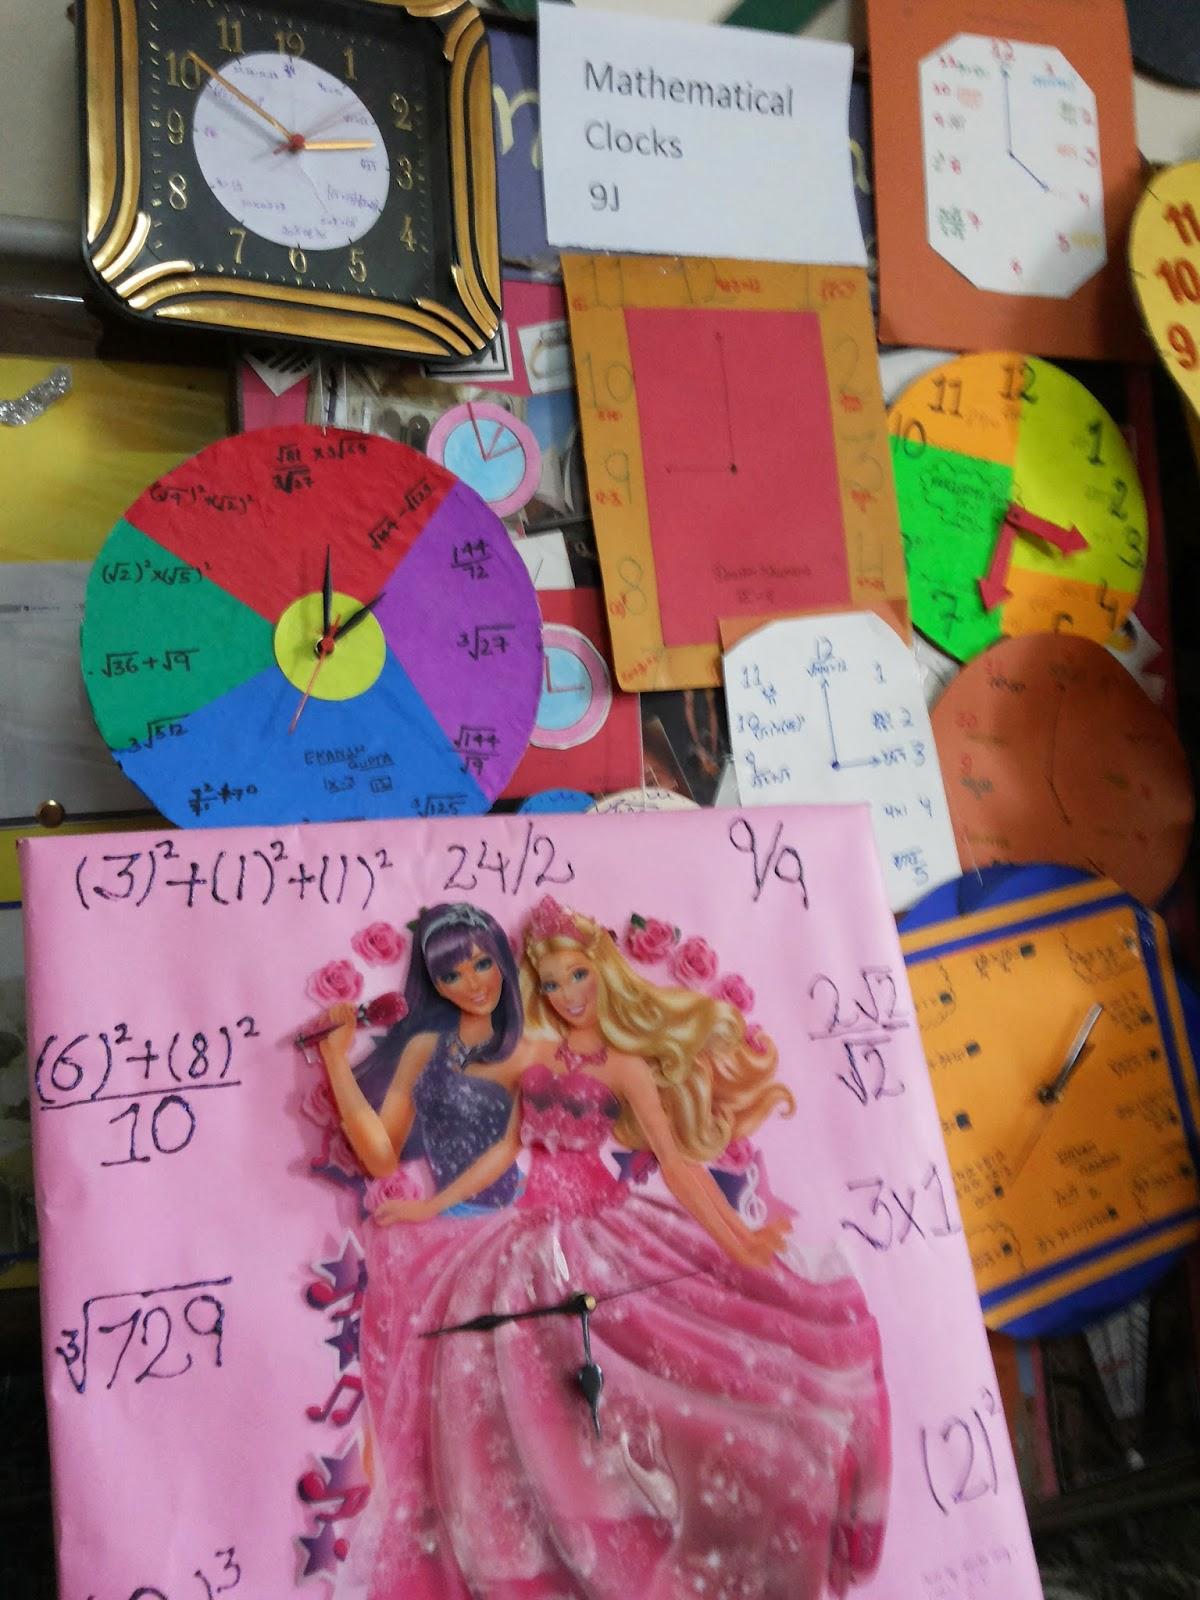 Maths Exhibition Models For Class 10 Cbse